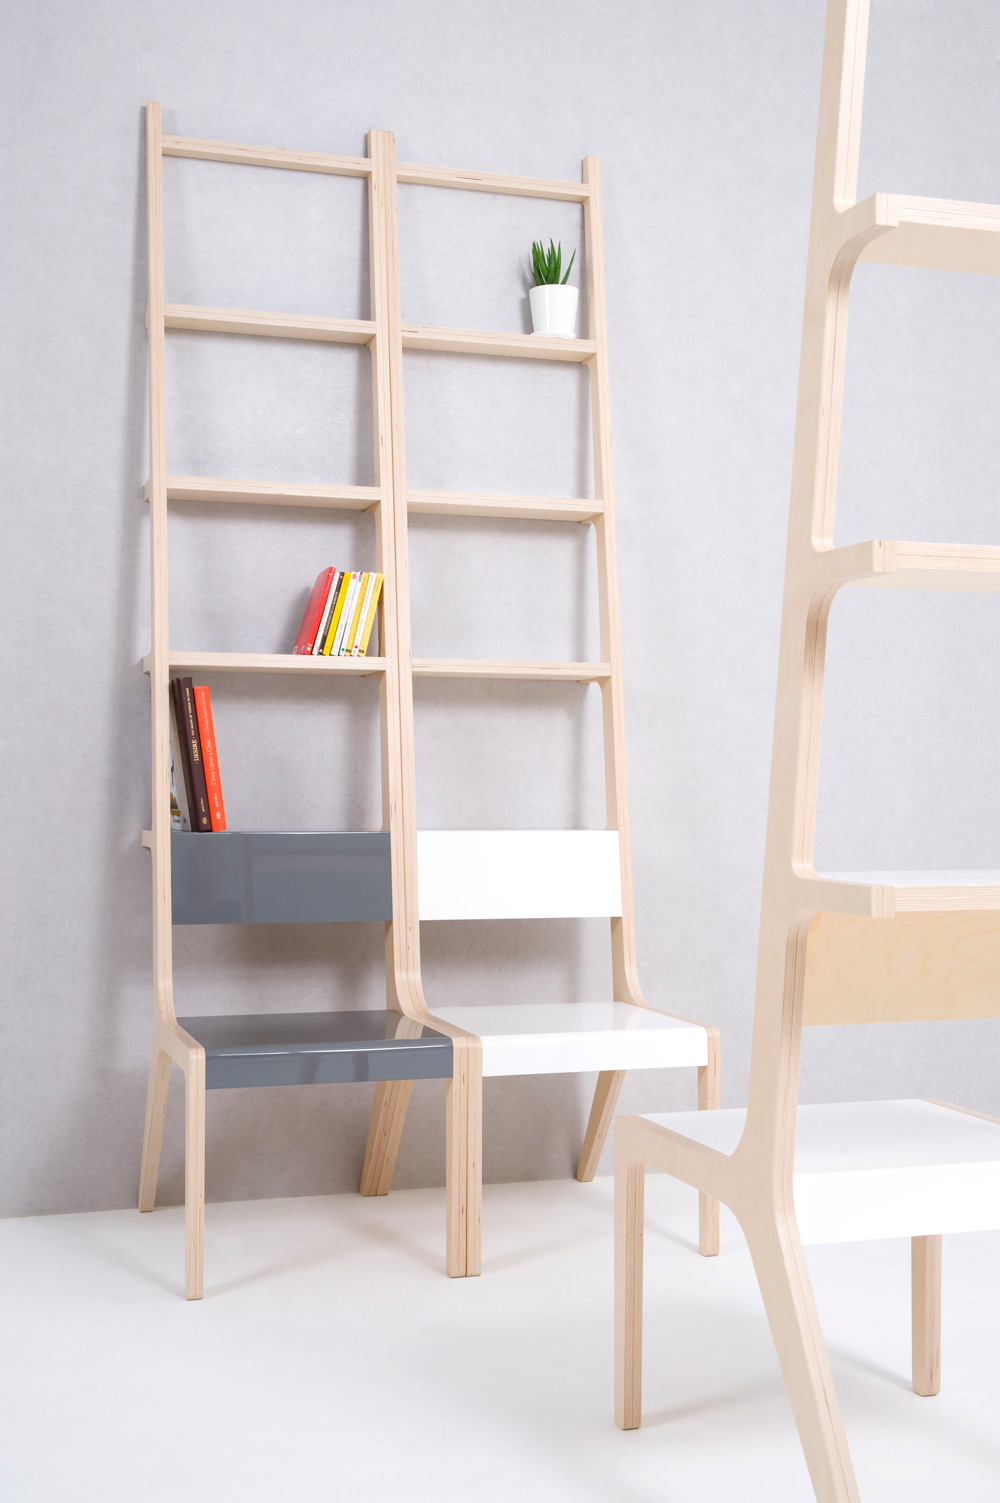 objet chair